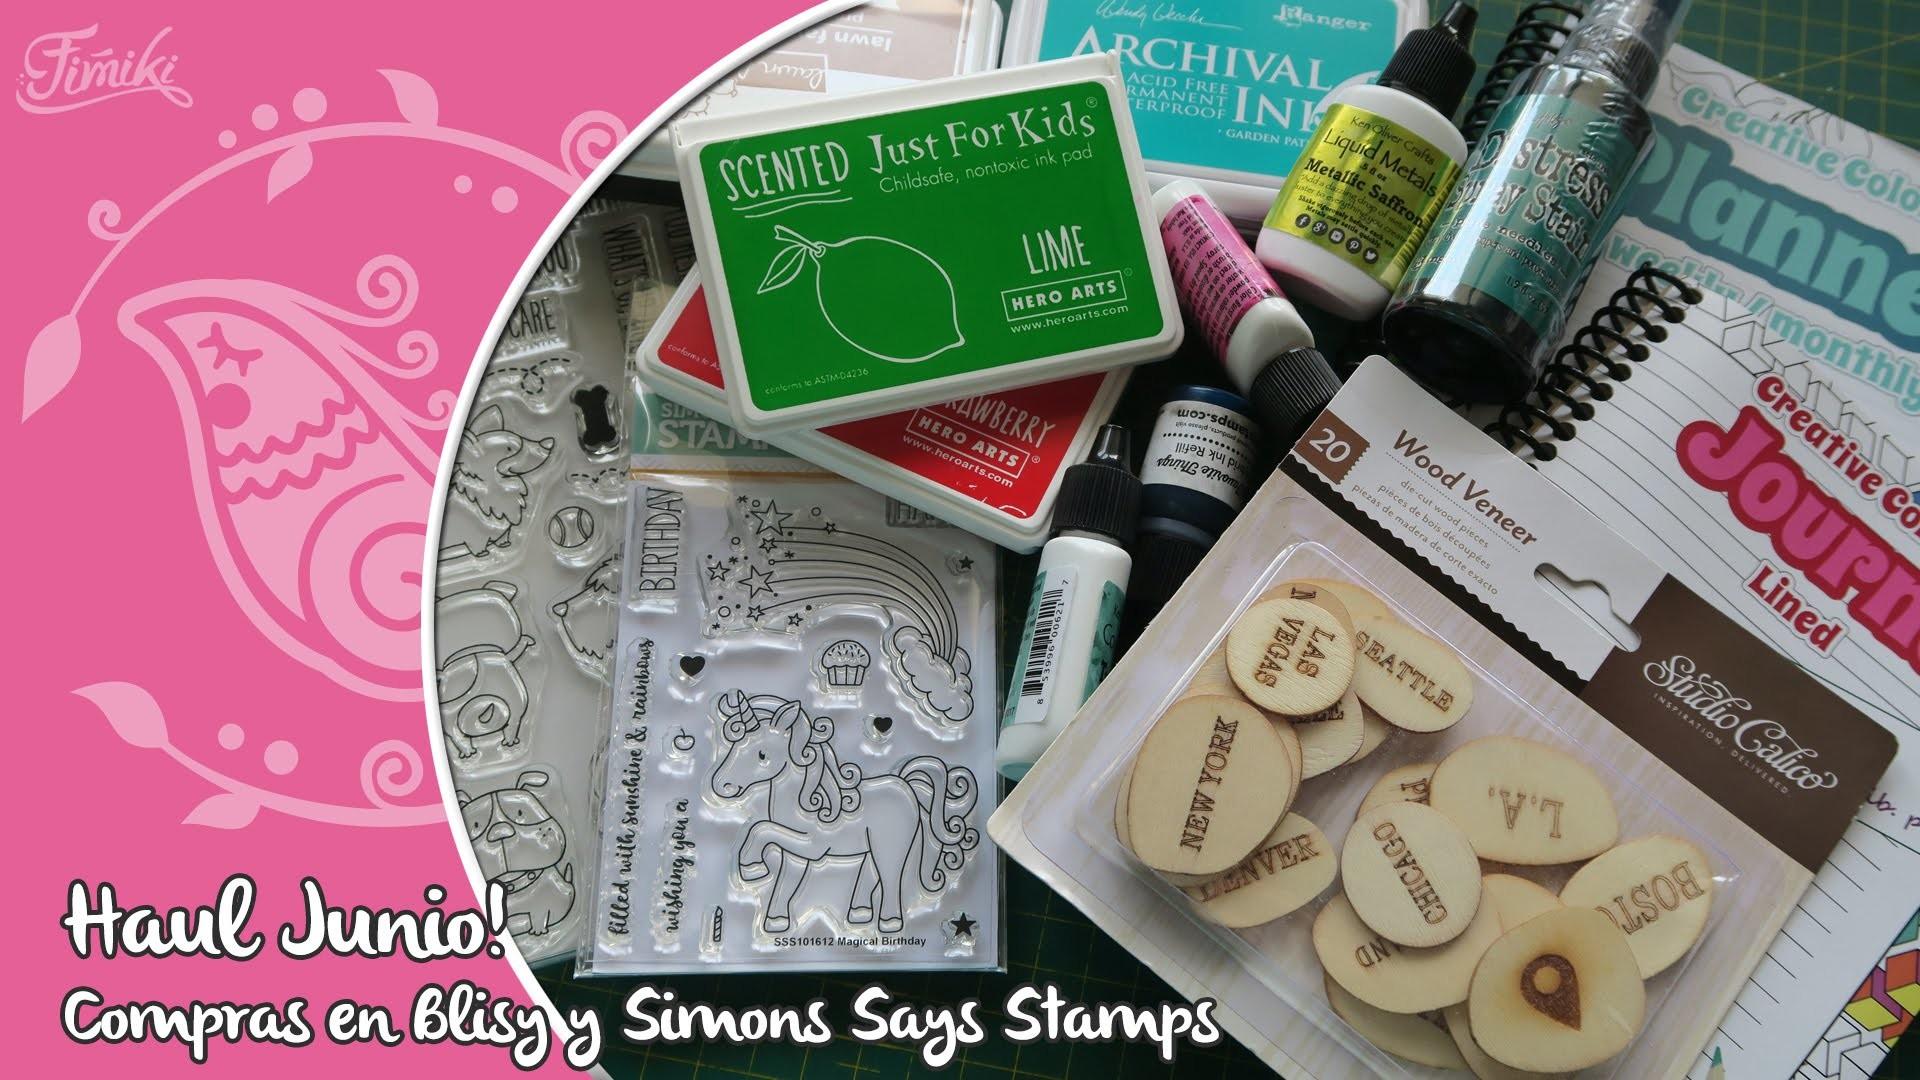 Haul de Scrapbooking, compras en Blitsy y Simons Says Stamps